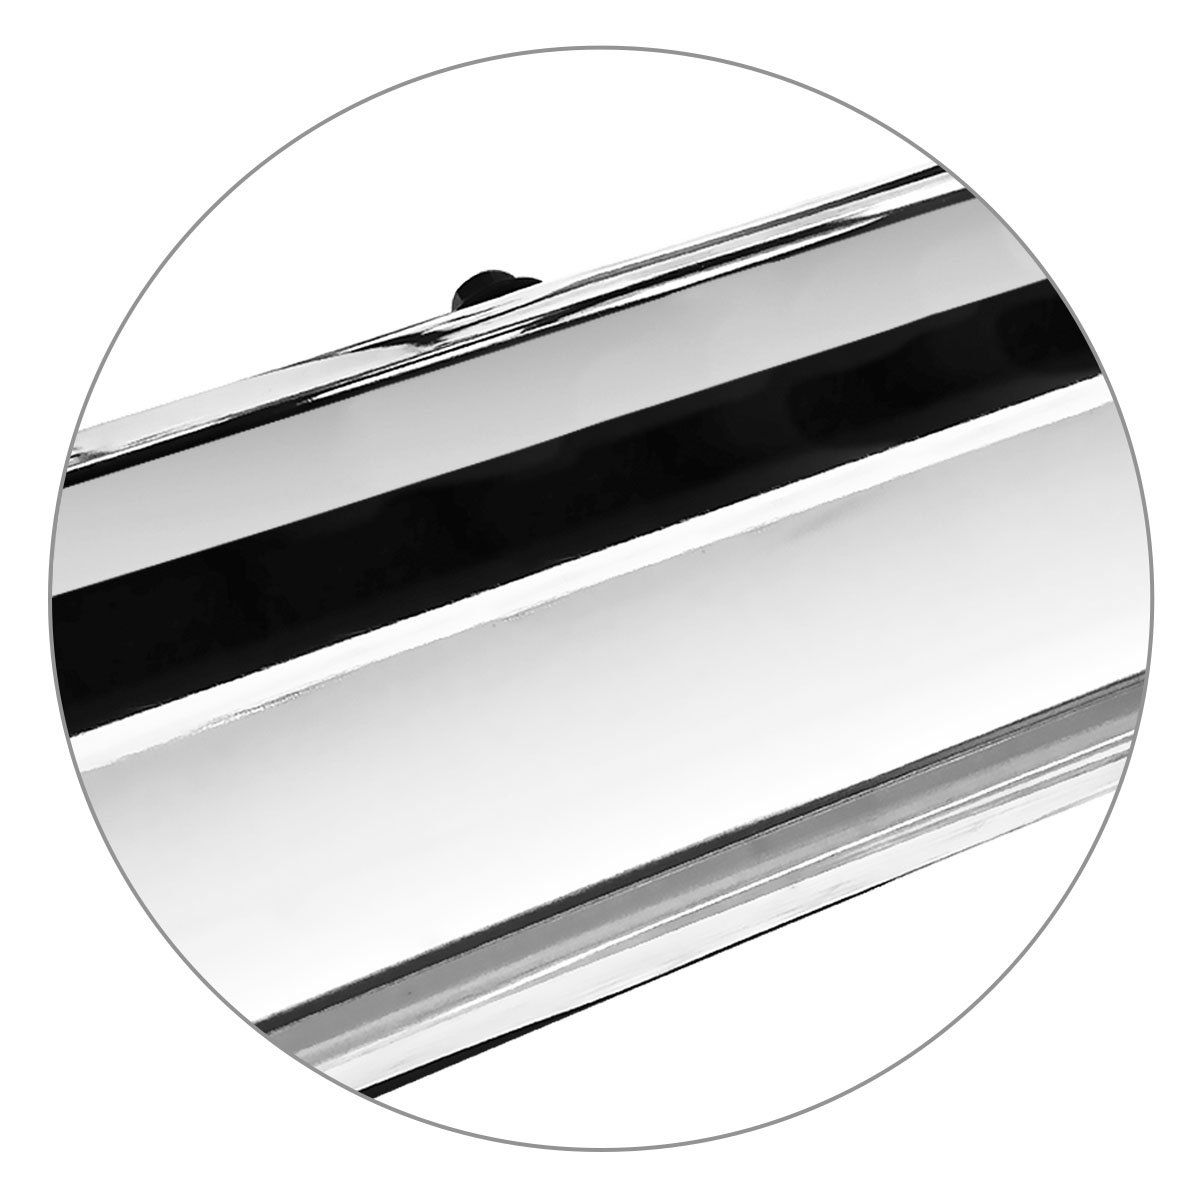 Estribo Lateral IX35 2011 a 2019 Oblongo Oval Cromado